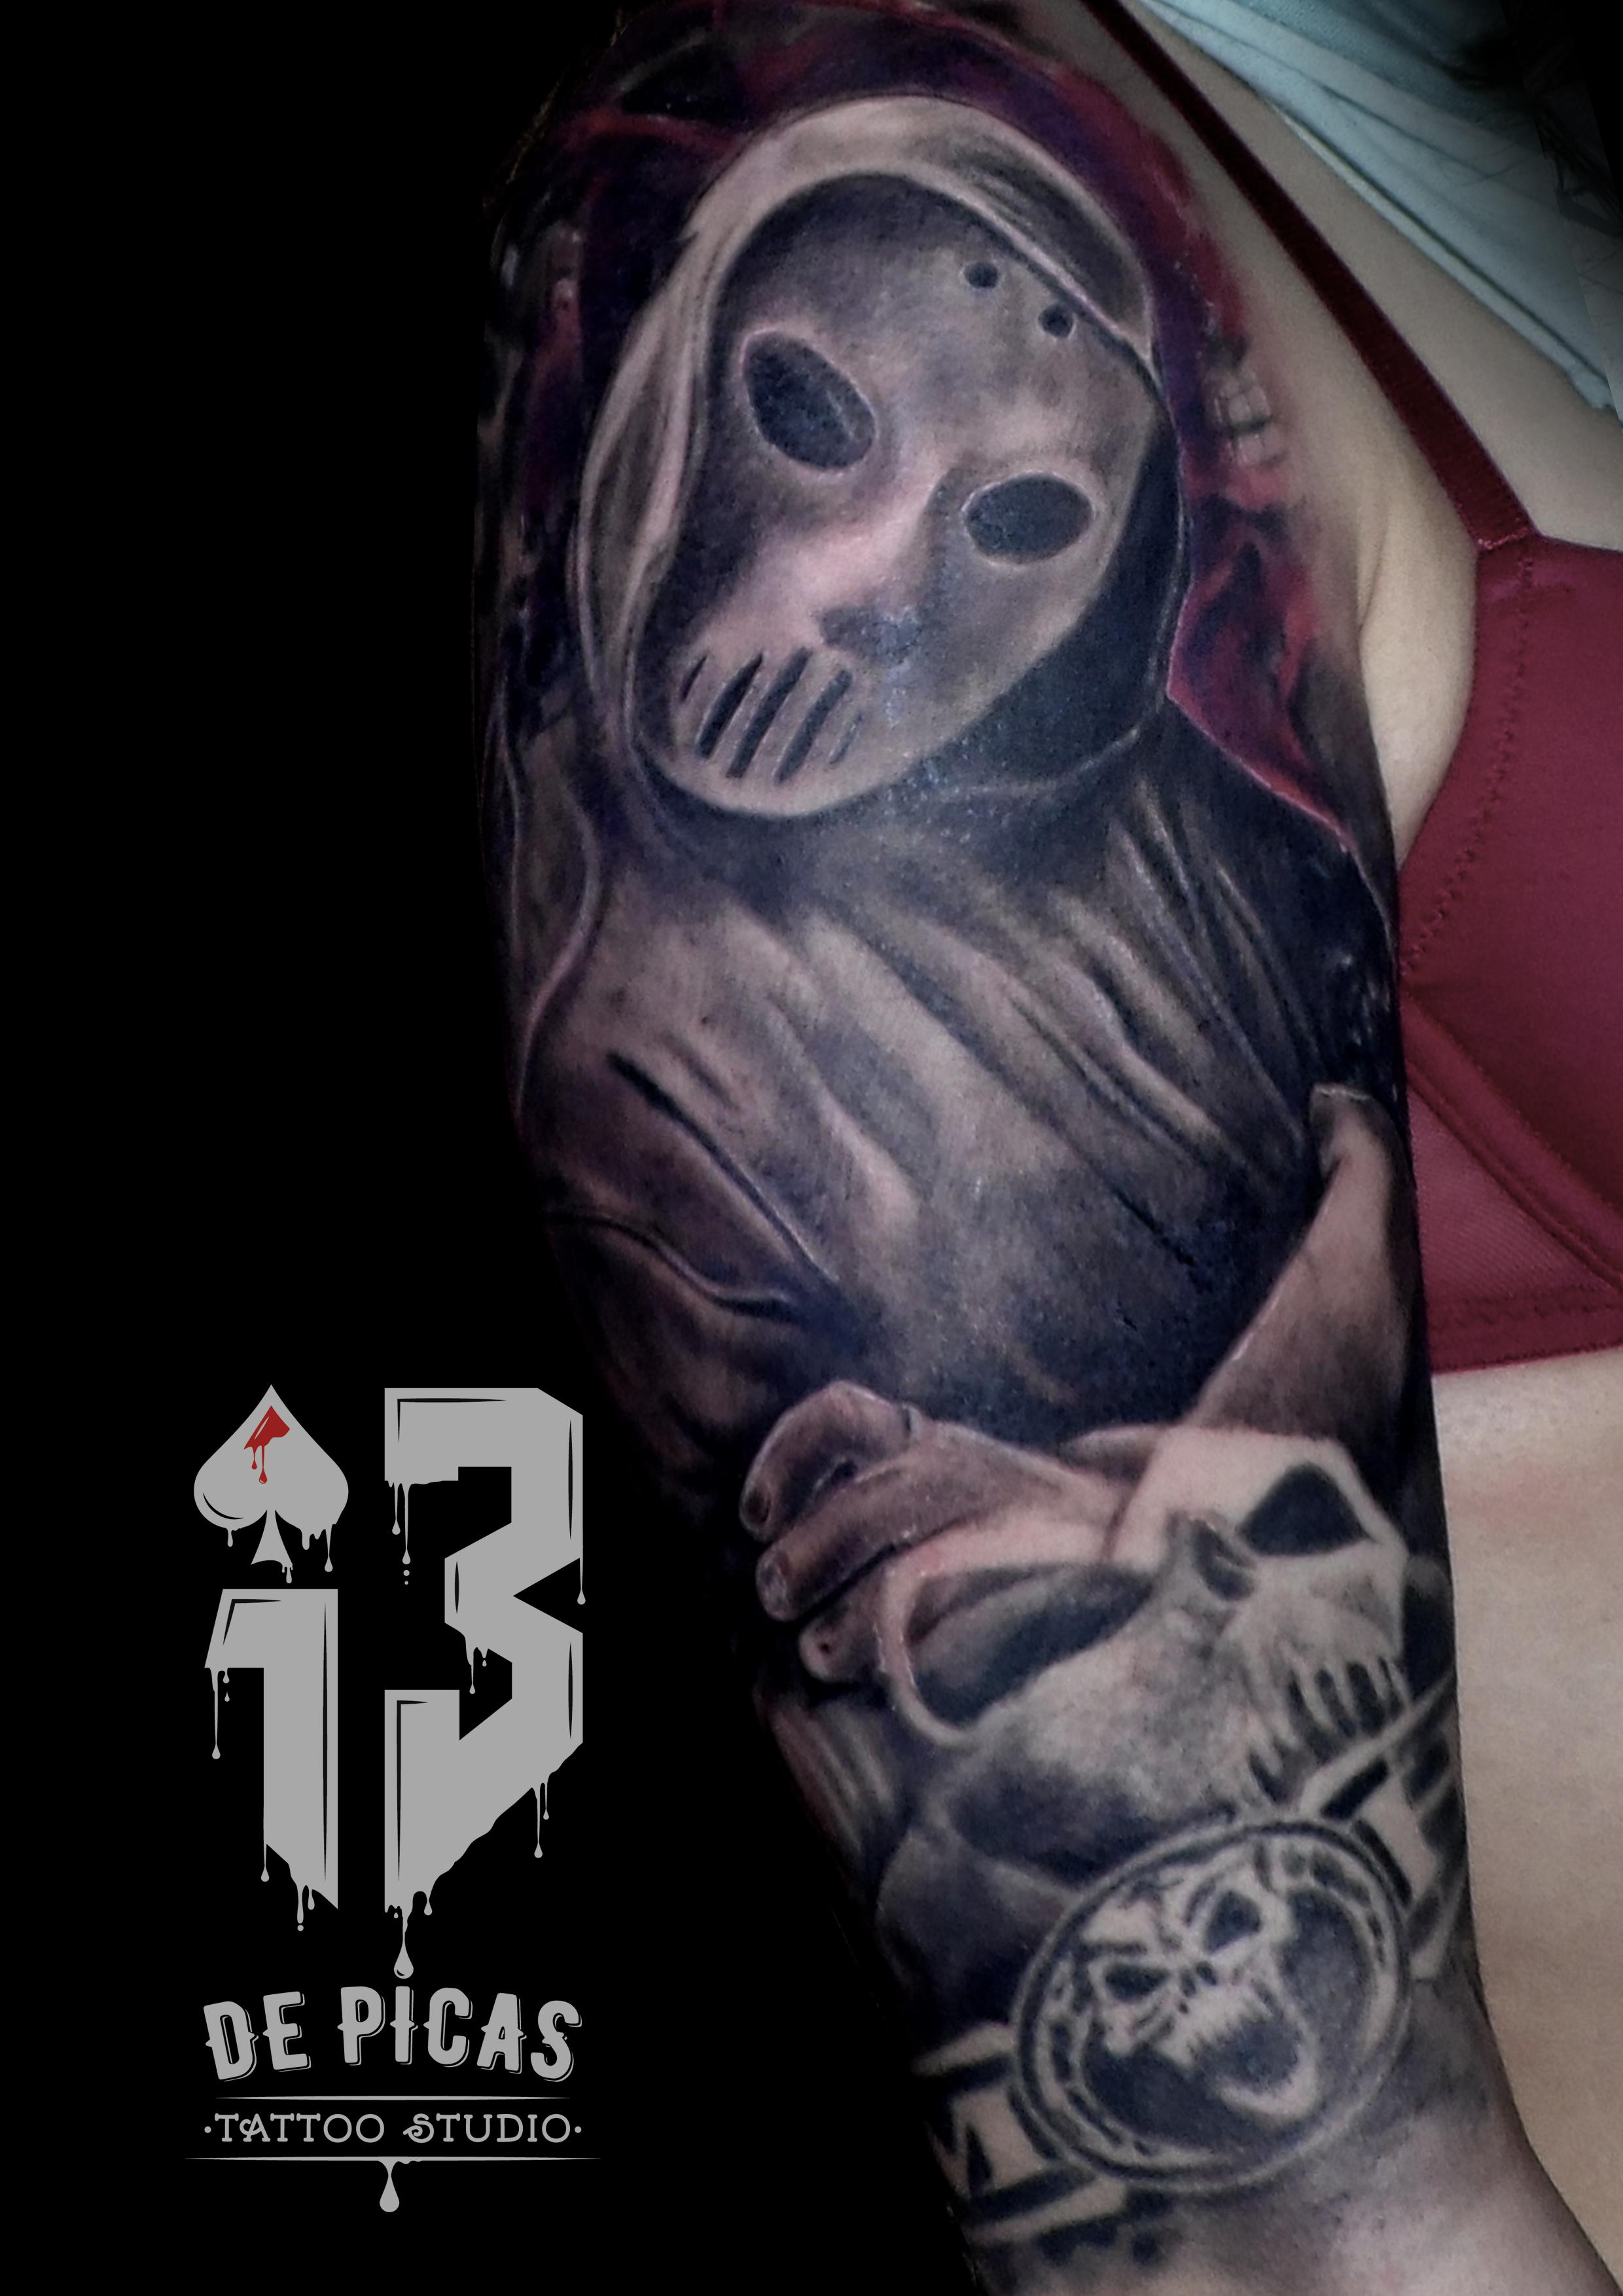 hardcore tatuaje tattoo hombro brazo 13depicas jaca huesca